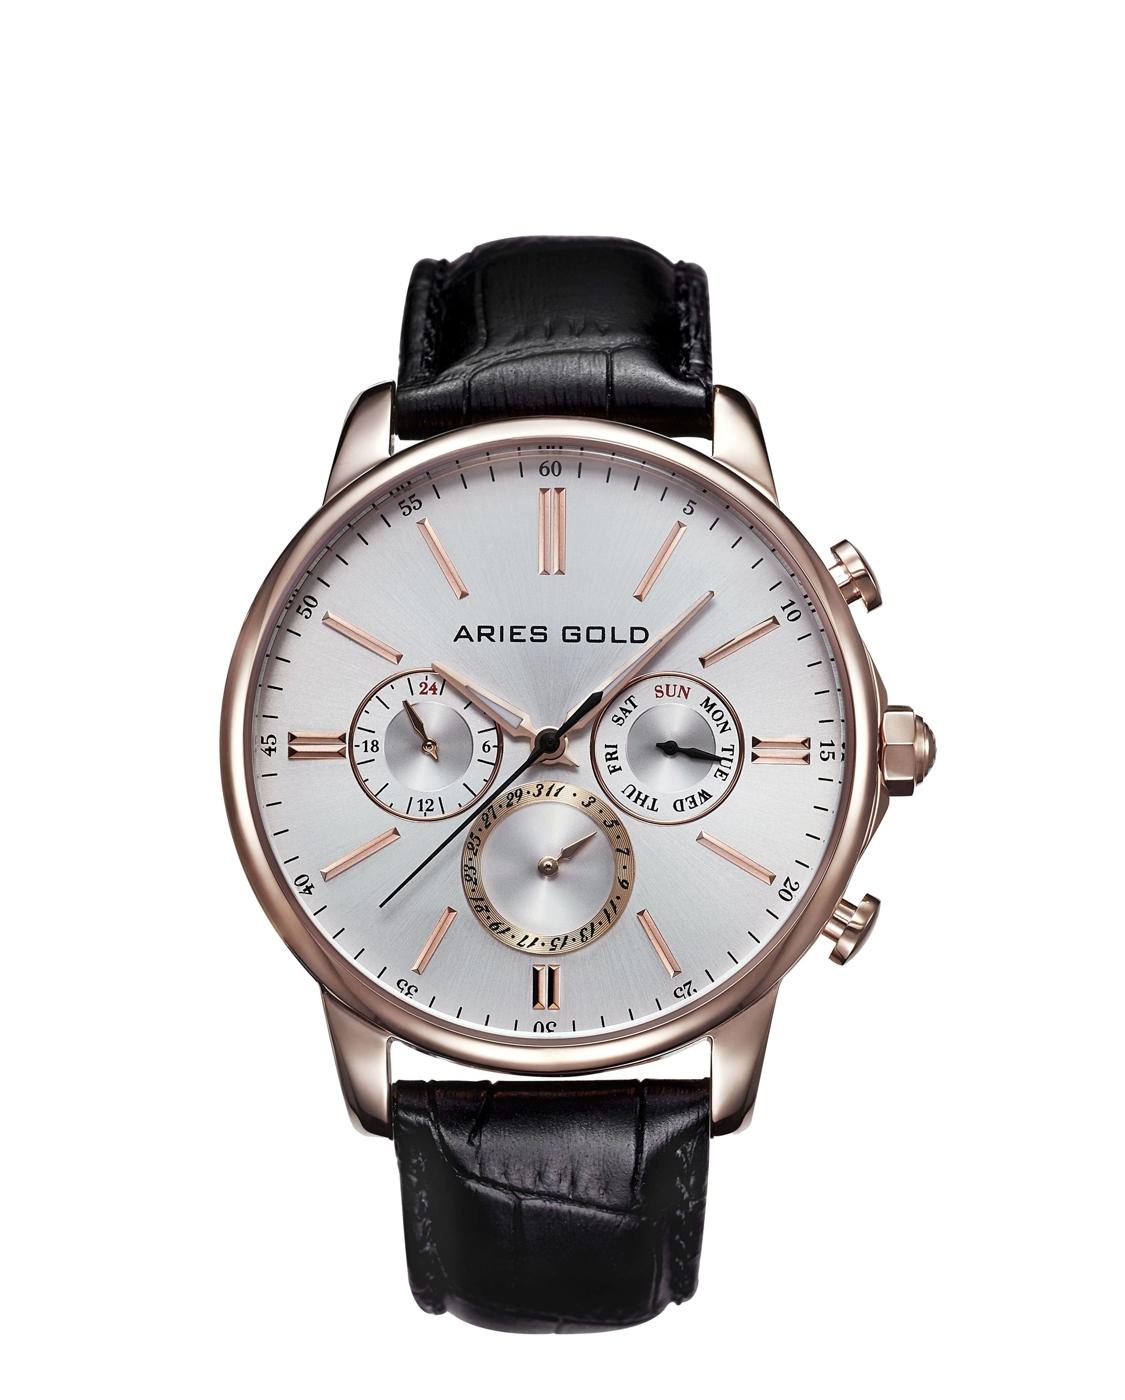 ★Aries Gold★-雅力士手錶-KENSINGTON-G 102 RG-SRG-錶現精品公司-原廠公司貨